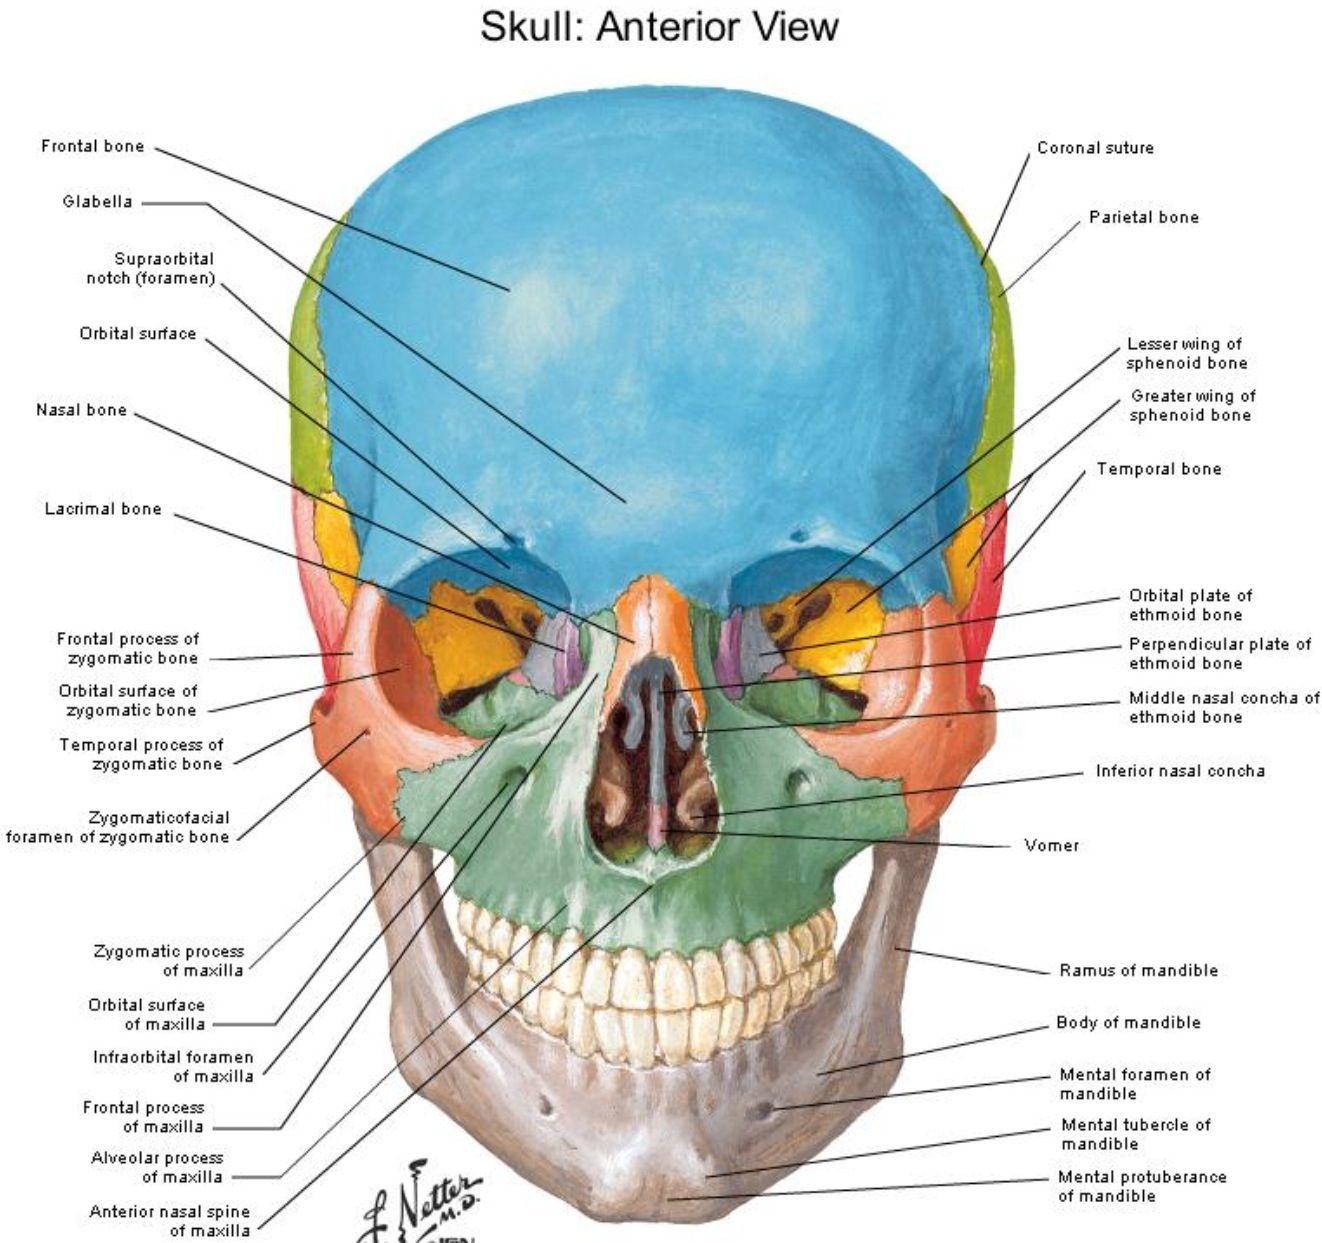 Anterior View Skull